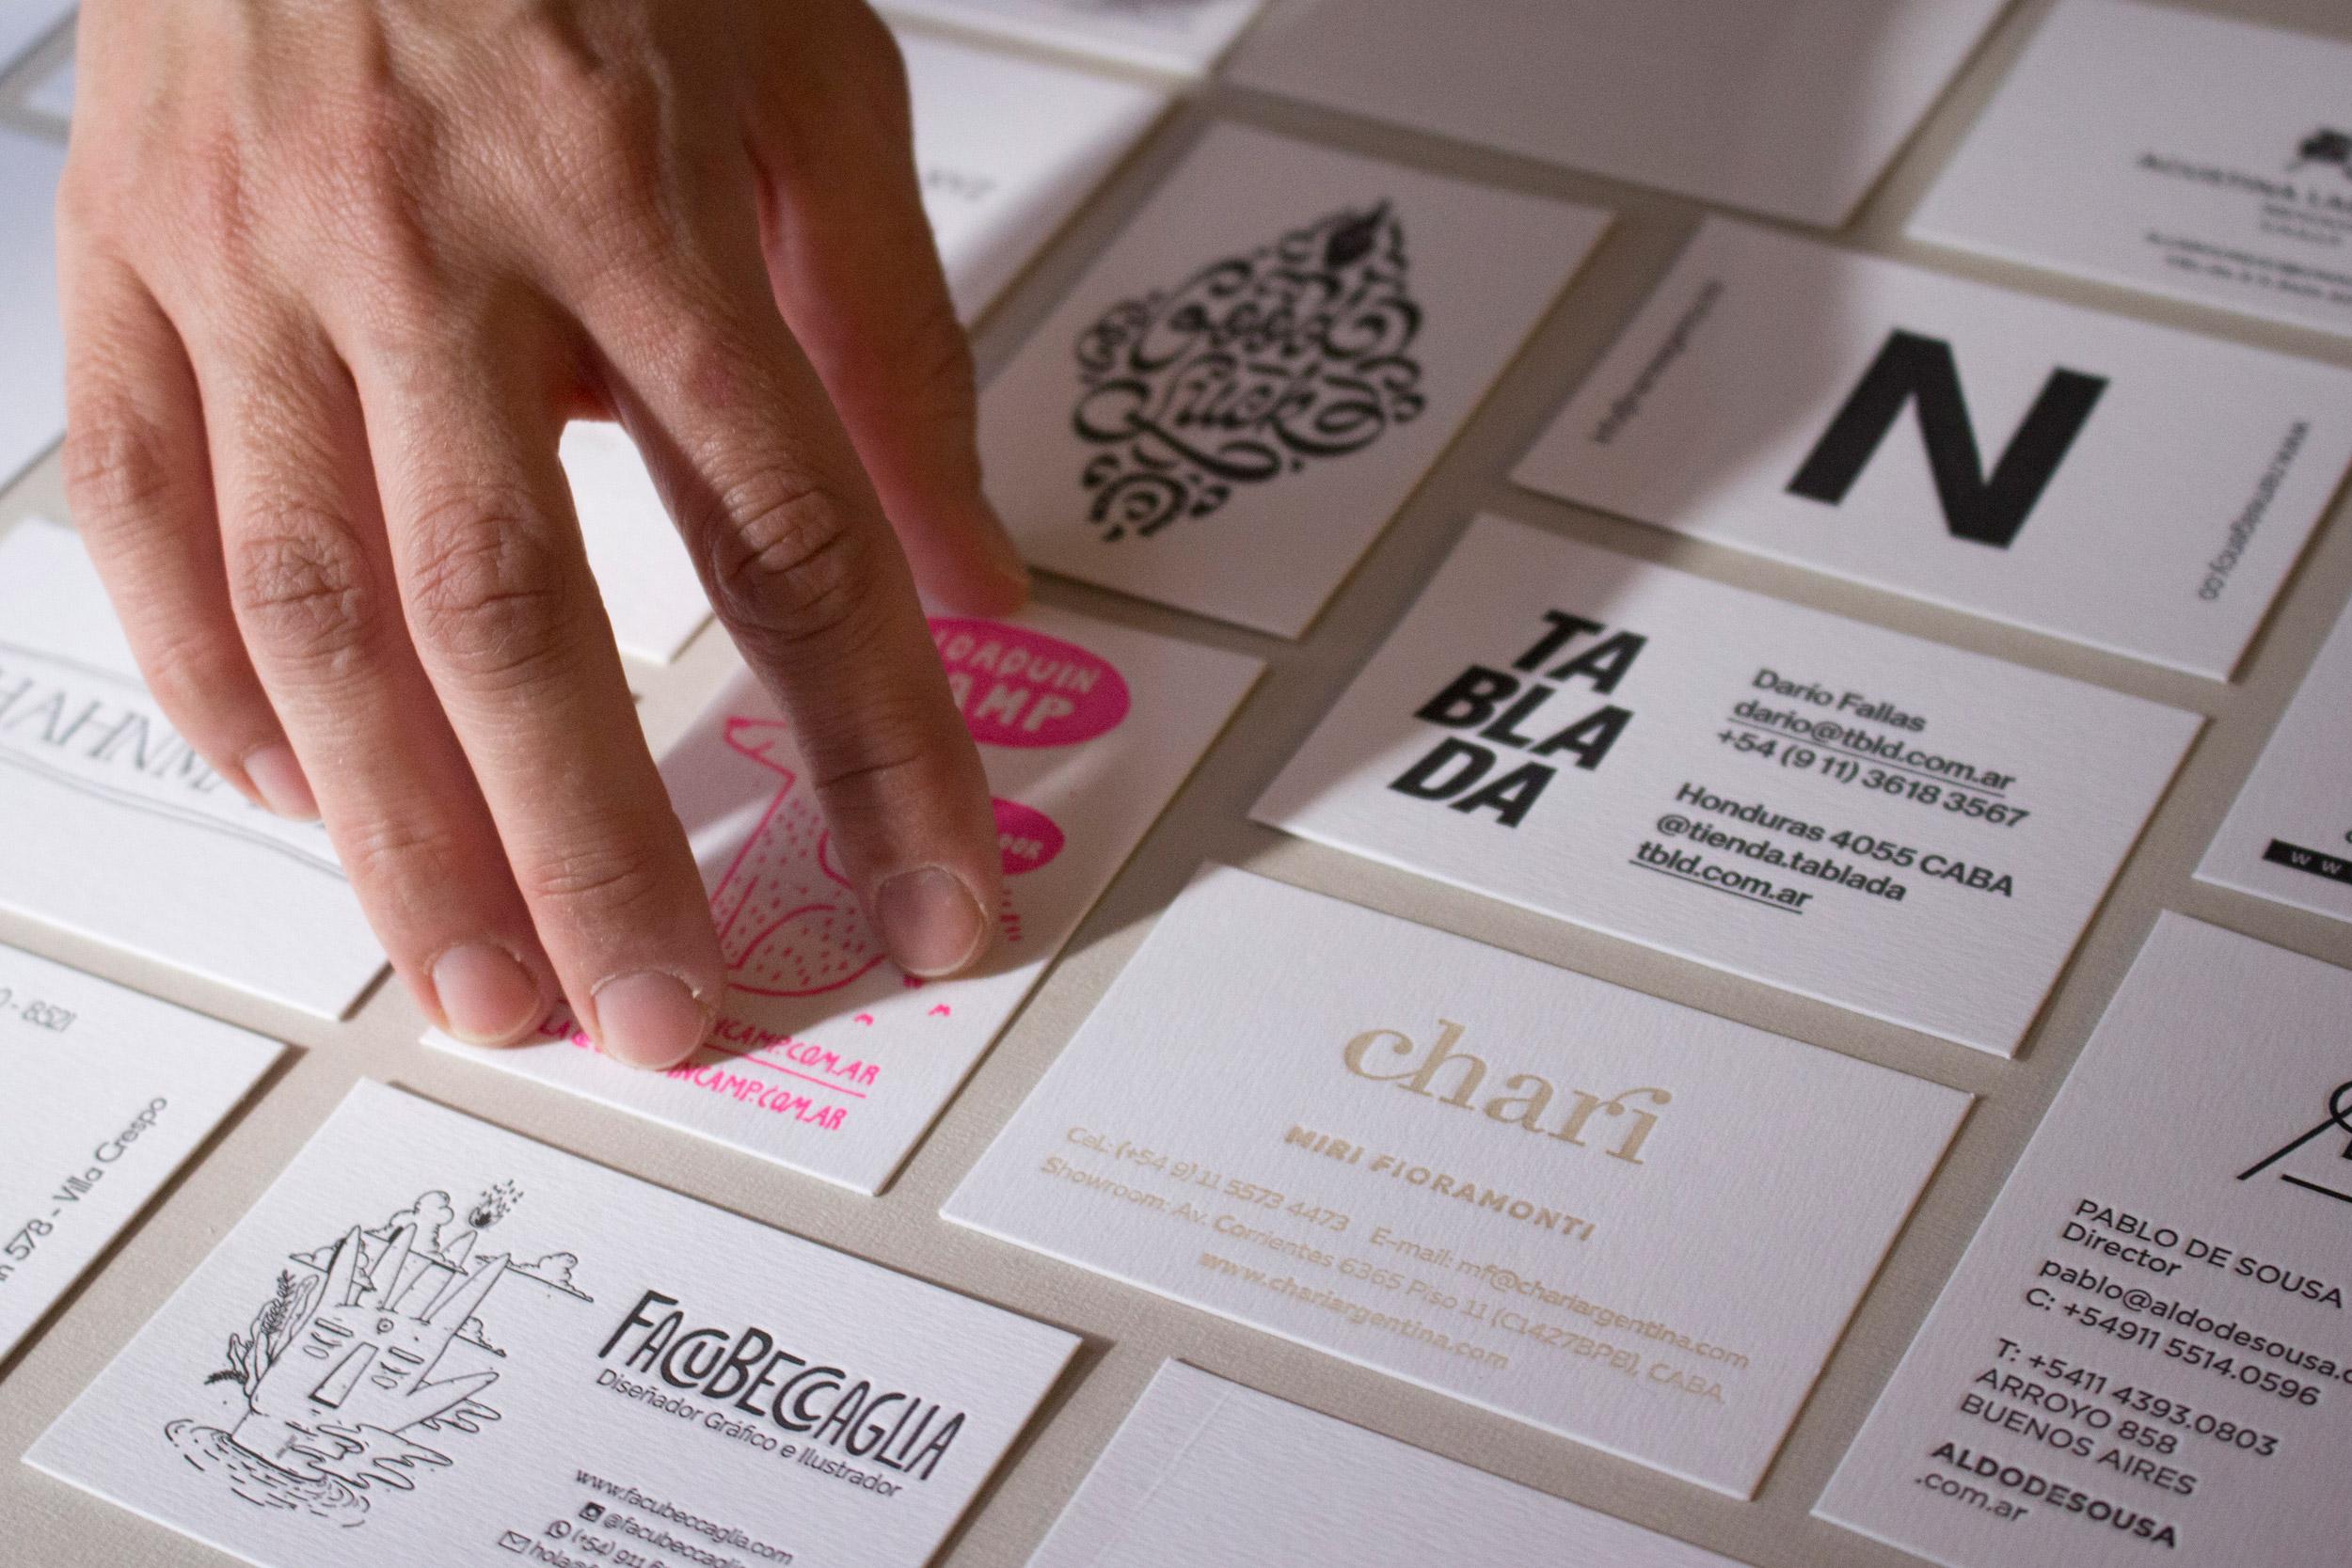 tarjetas-personales-vista-general-papel-principal-letterpress-imprenta-tipografica-1.jpg